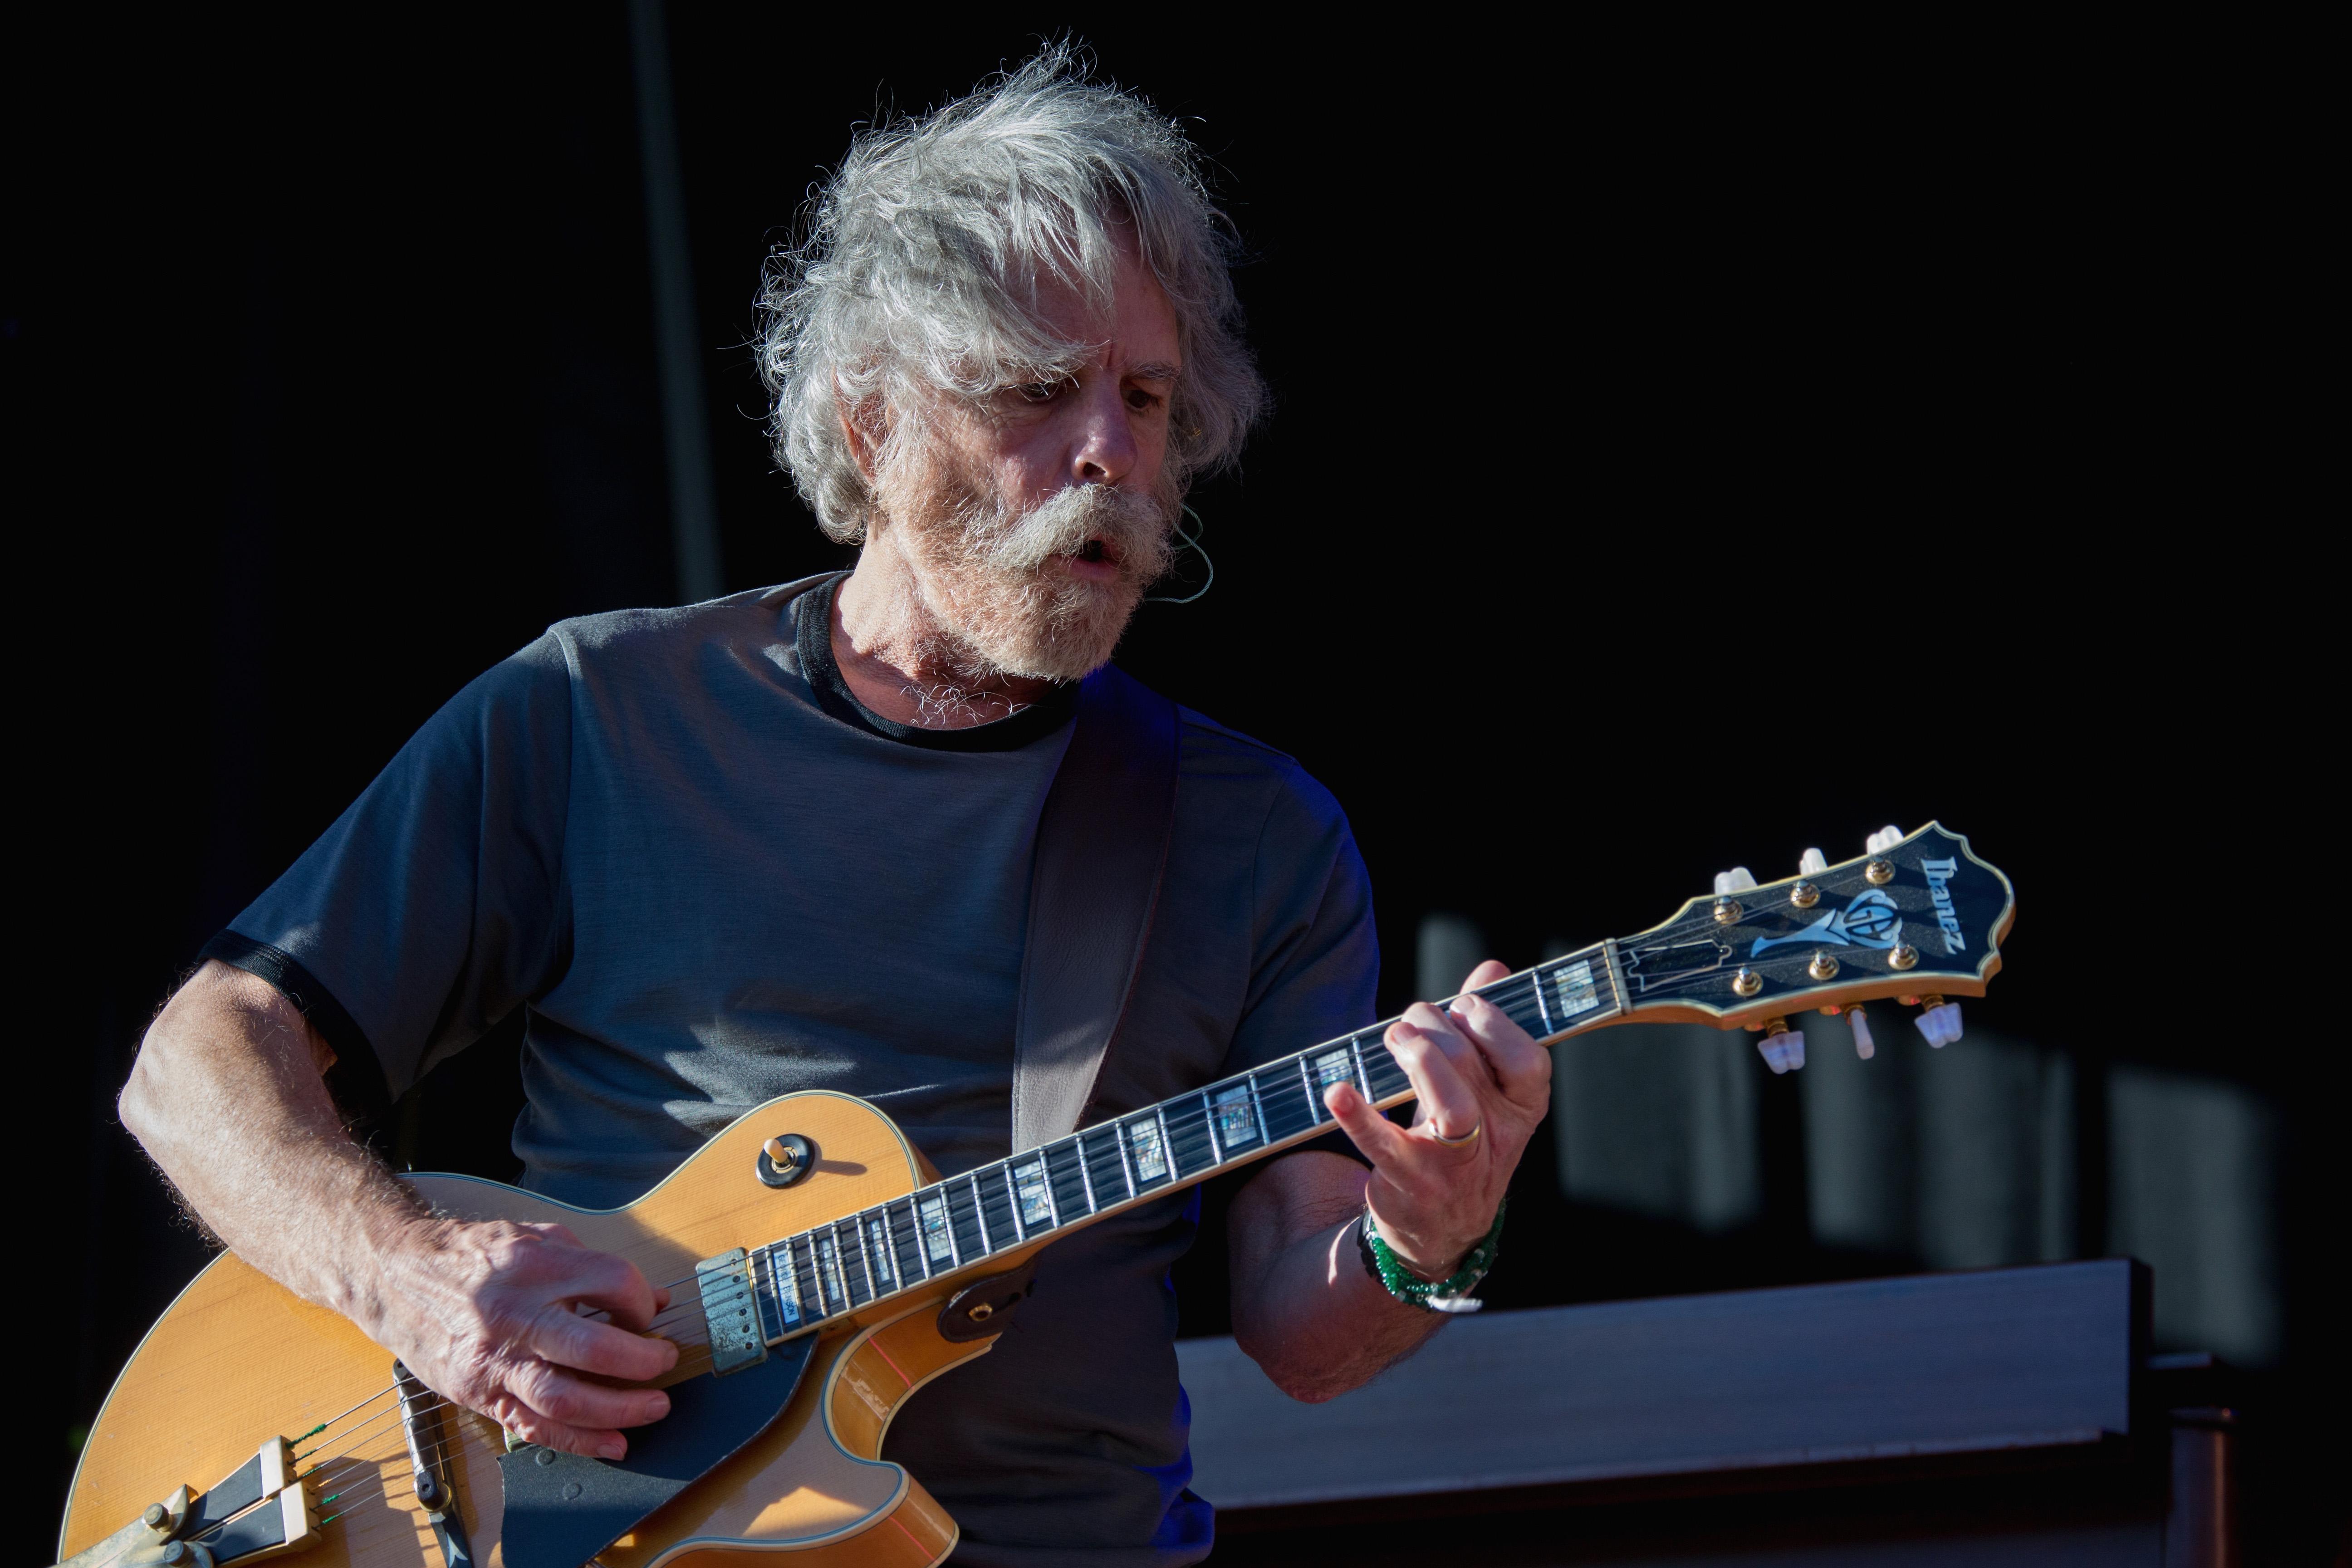 Netflix Details Documentary on Grateful Dead Founder Bob Weir